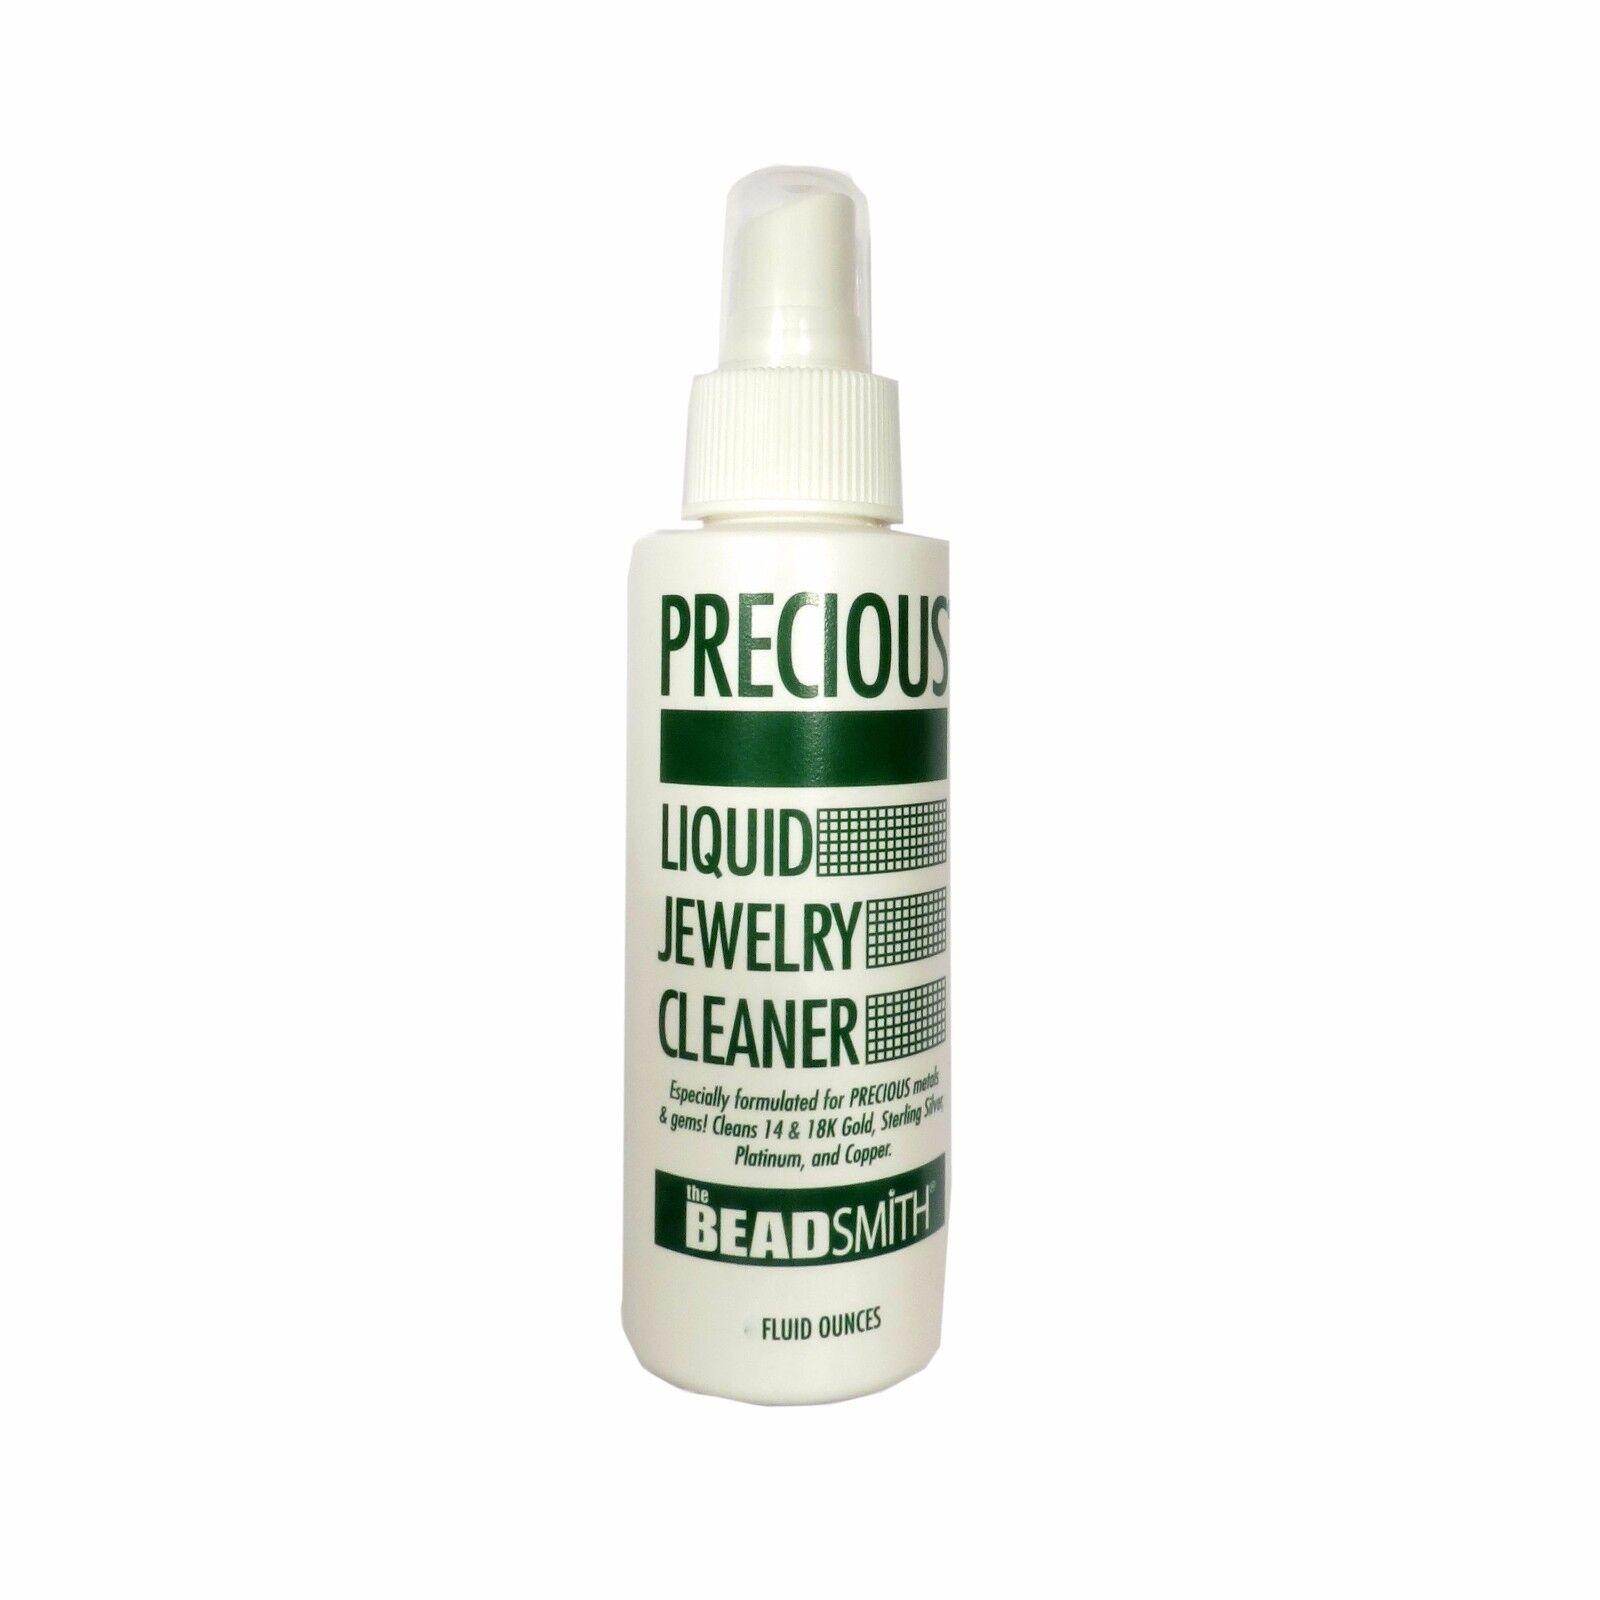 Precious Liquid Jewelry Cleaner - Spray On & Rinse - 4 Ounce